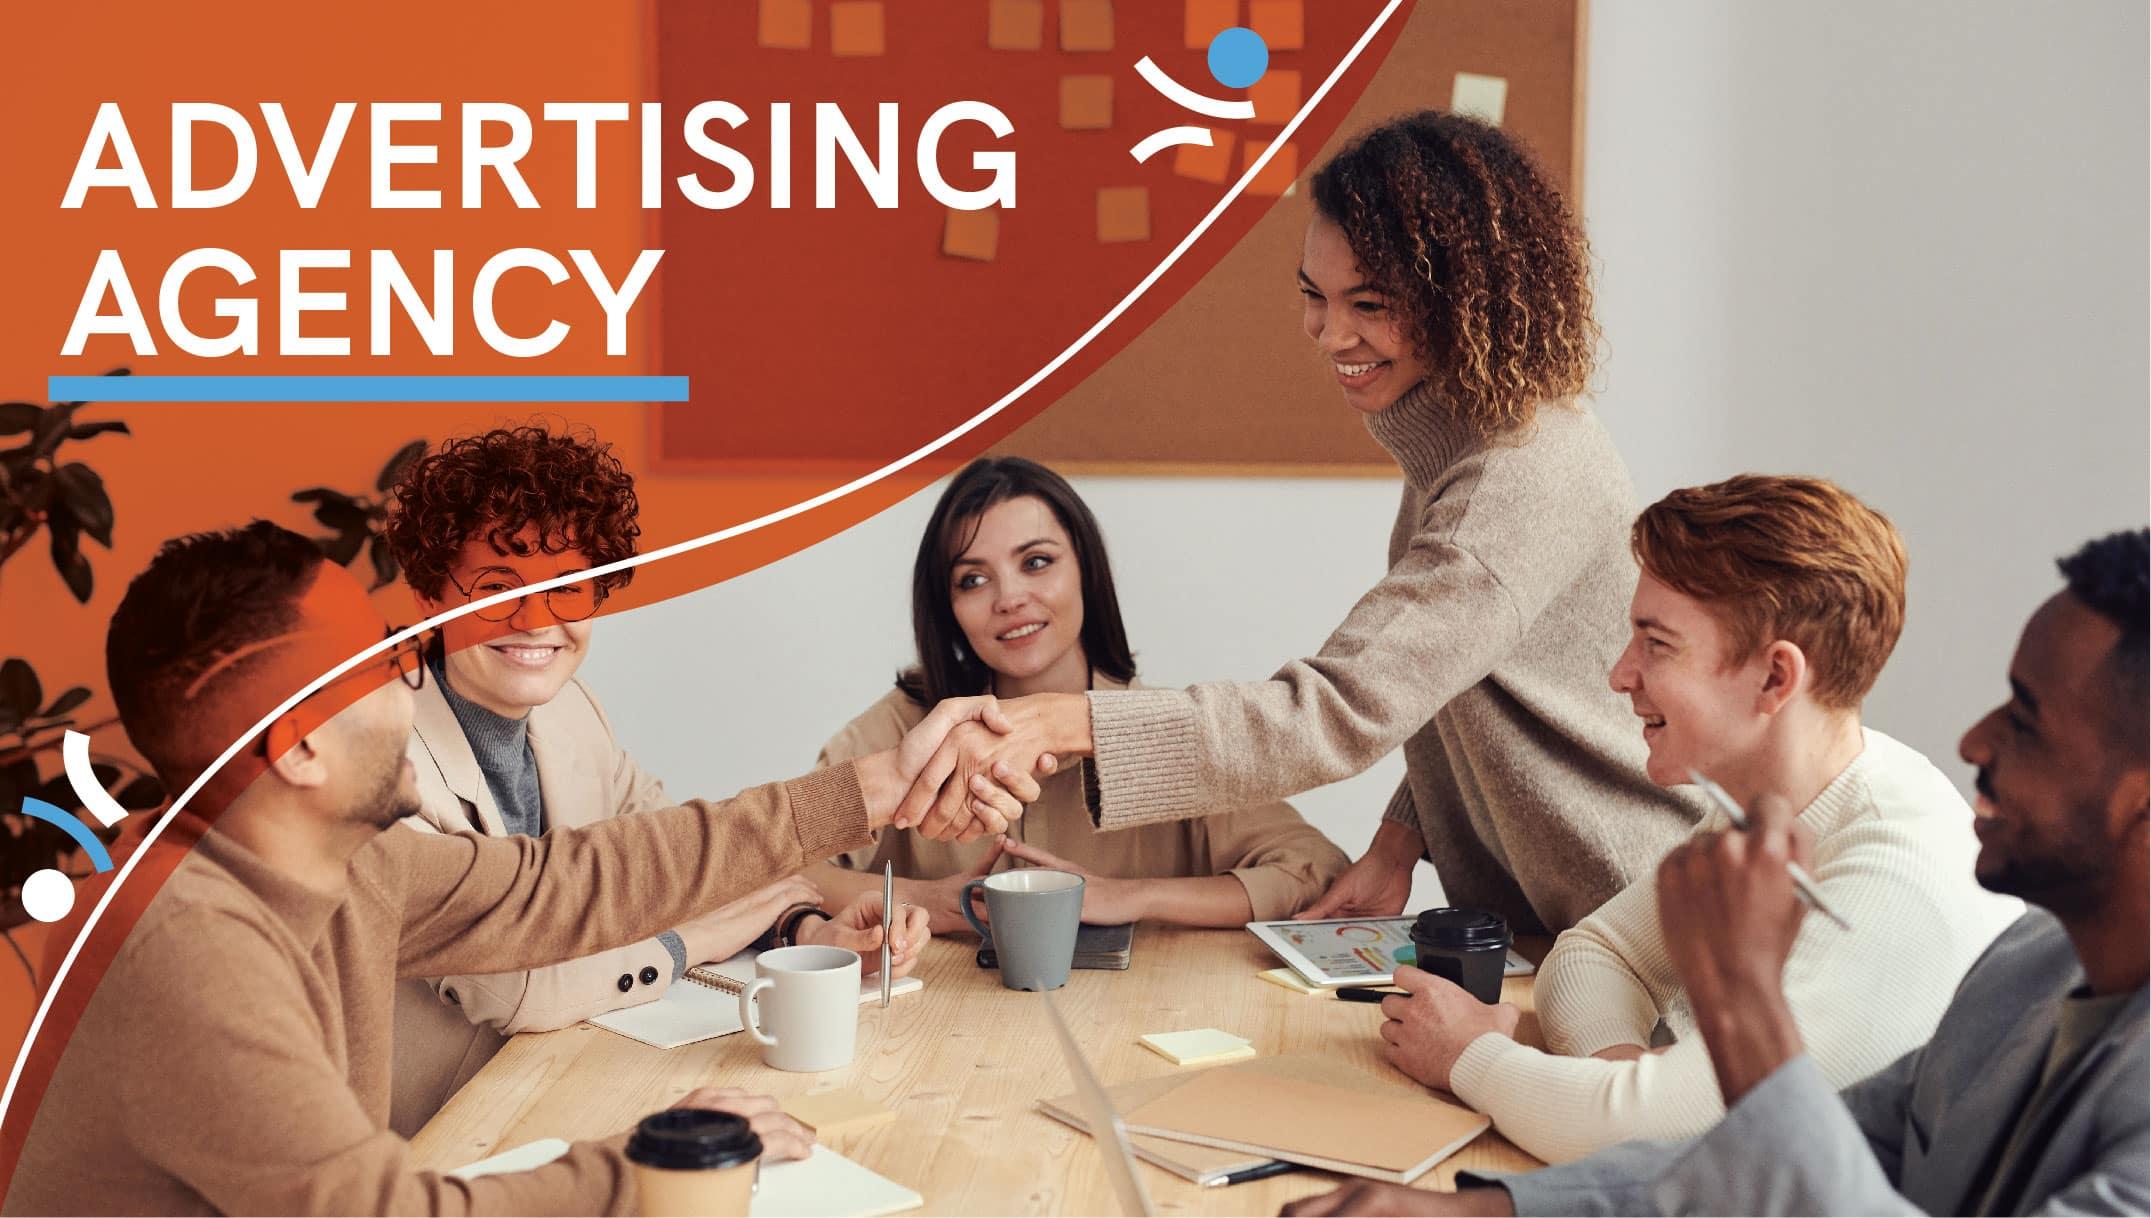 Ethic Adveritsing Agency industry vertical image for advertising agencies advertising